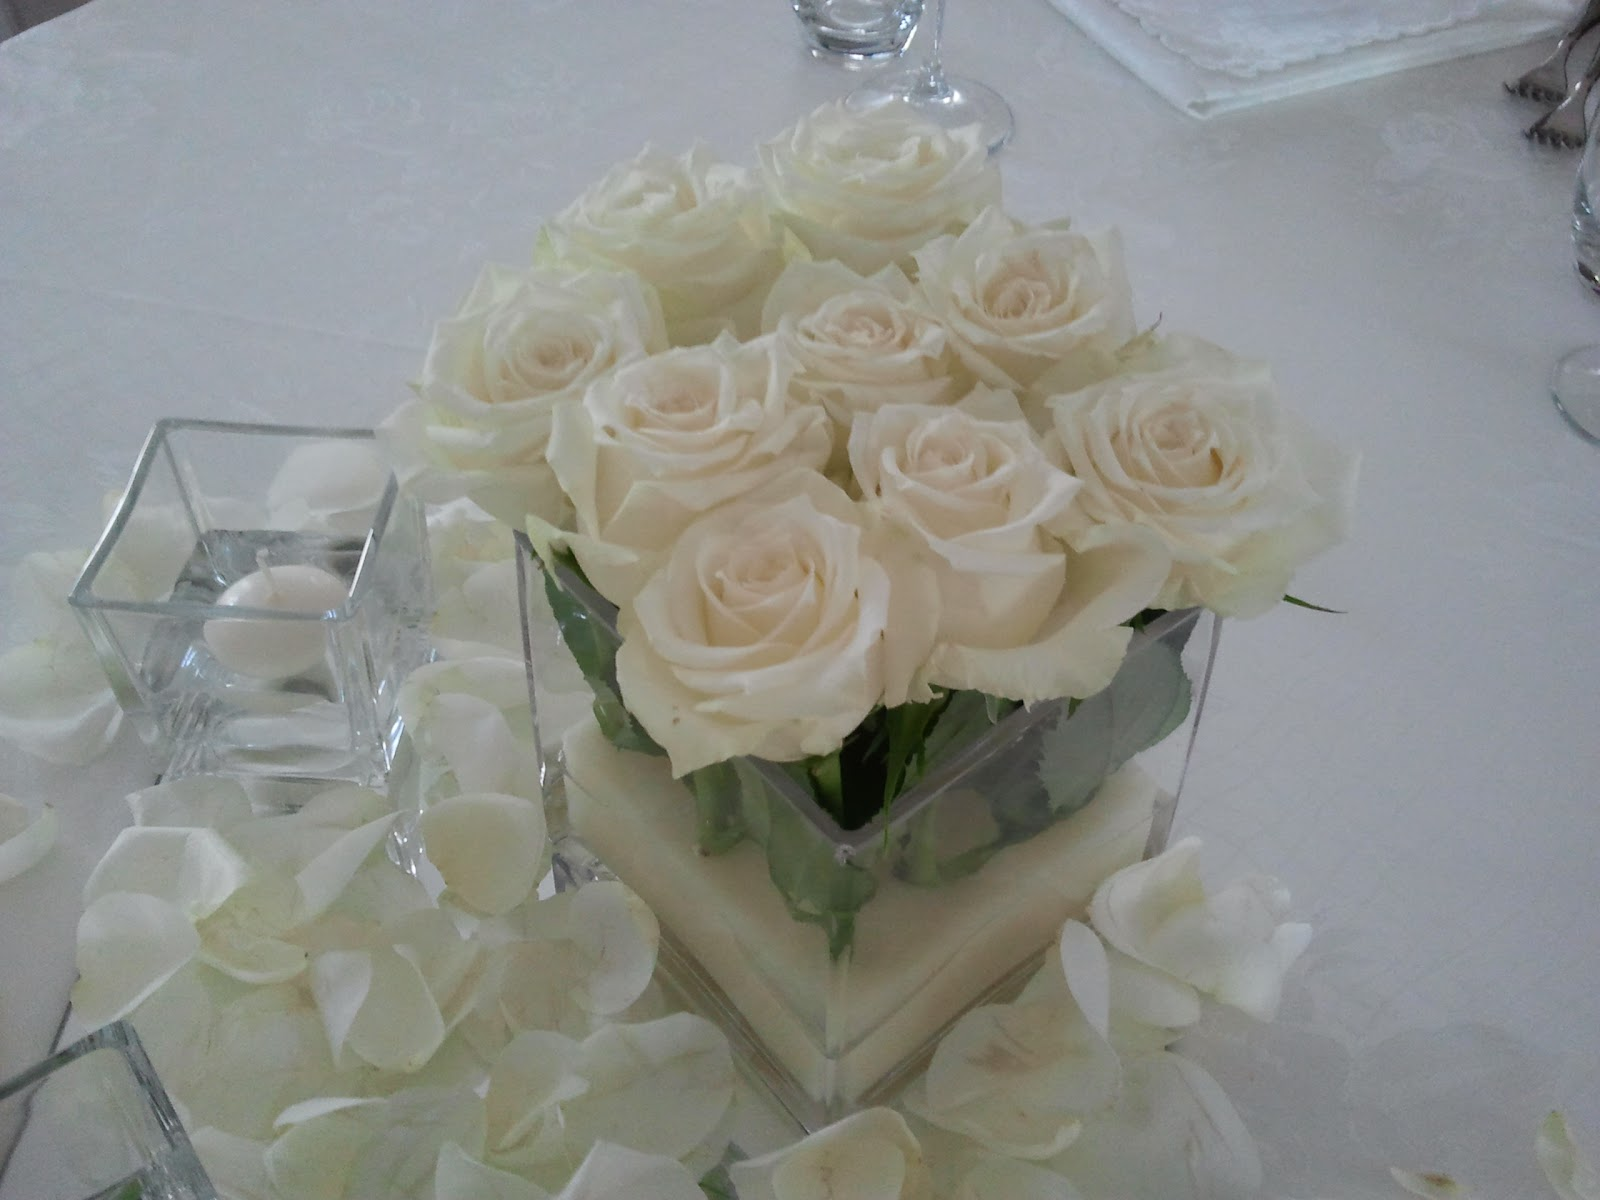 Mareventi wedding planner ravenna allestimenti floreali for Centrotavola matrimonio candele